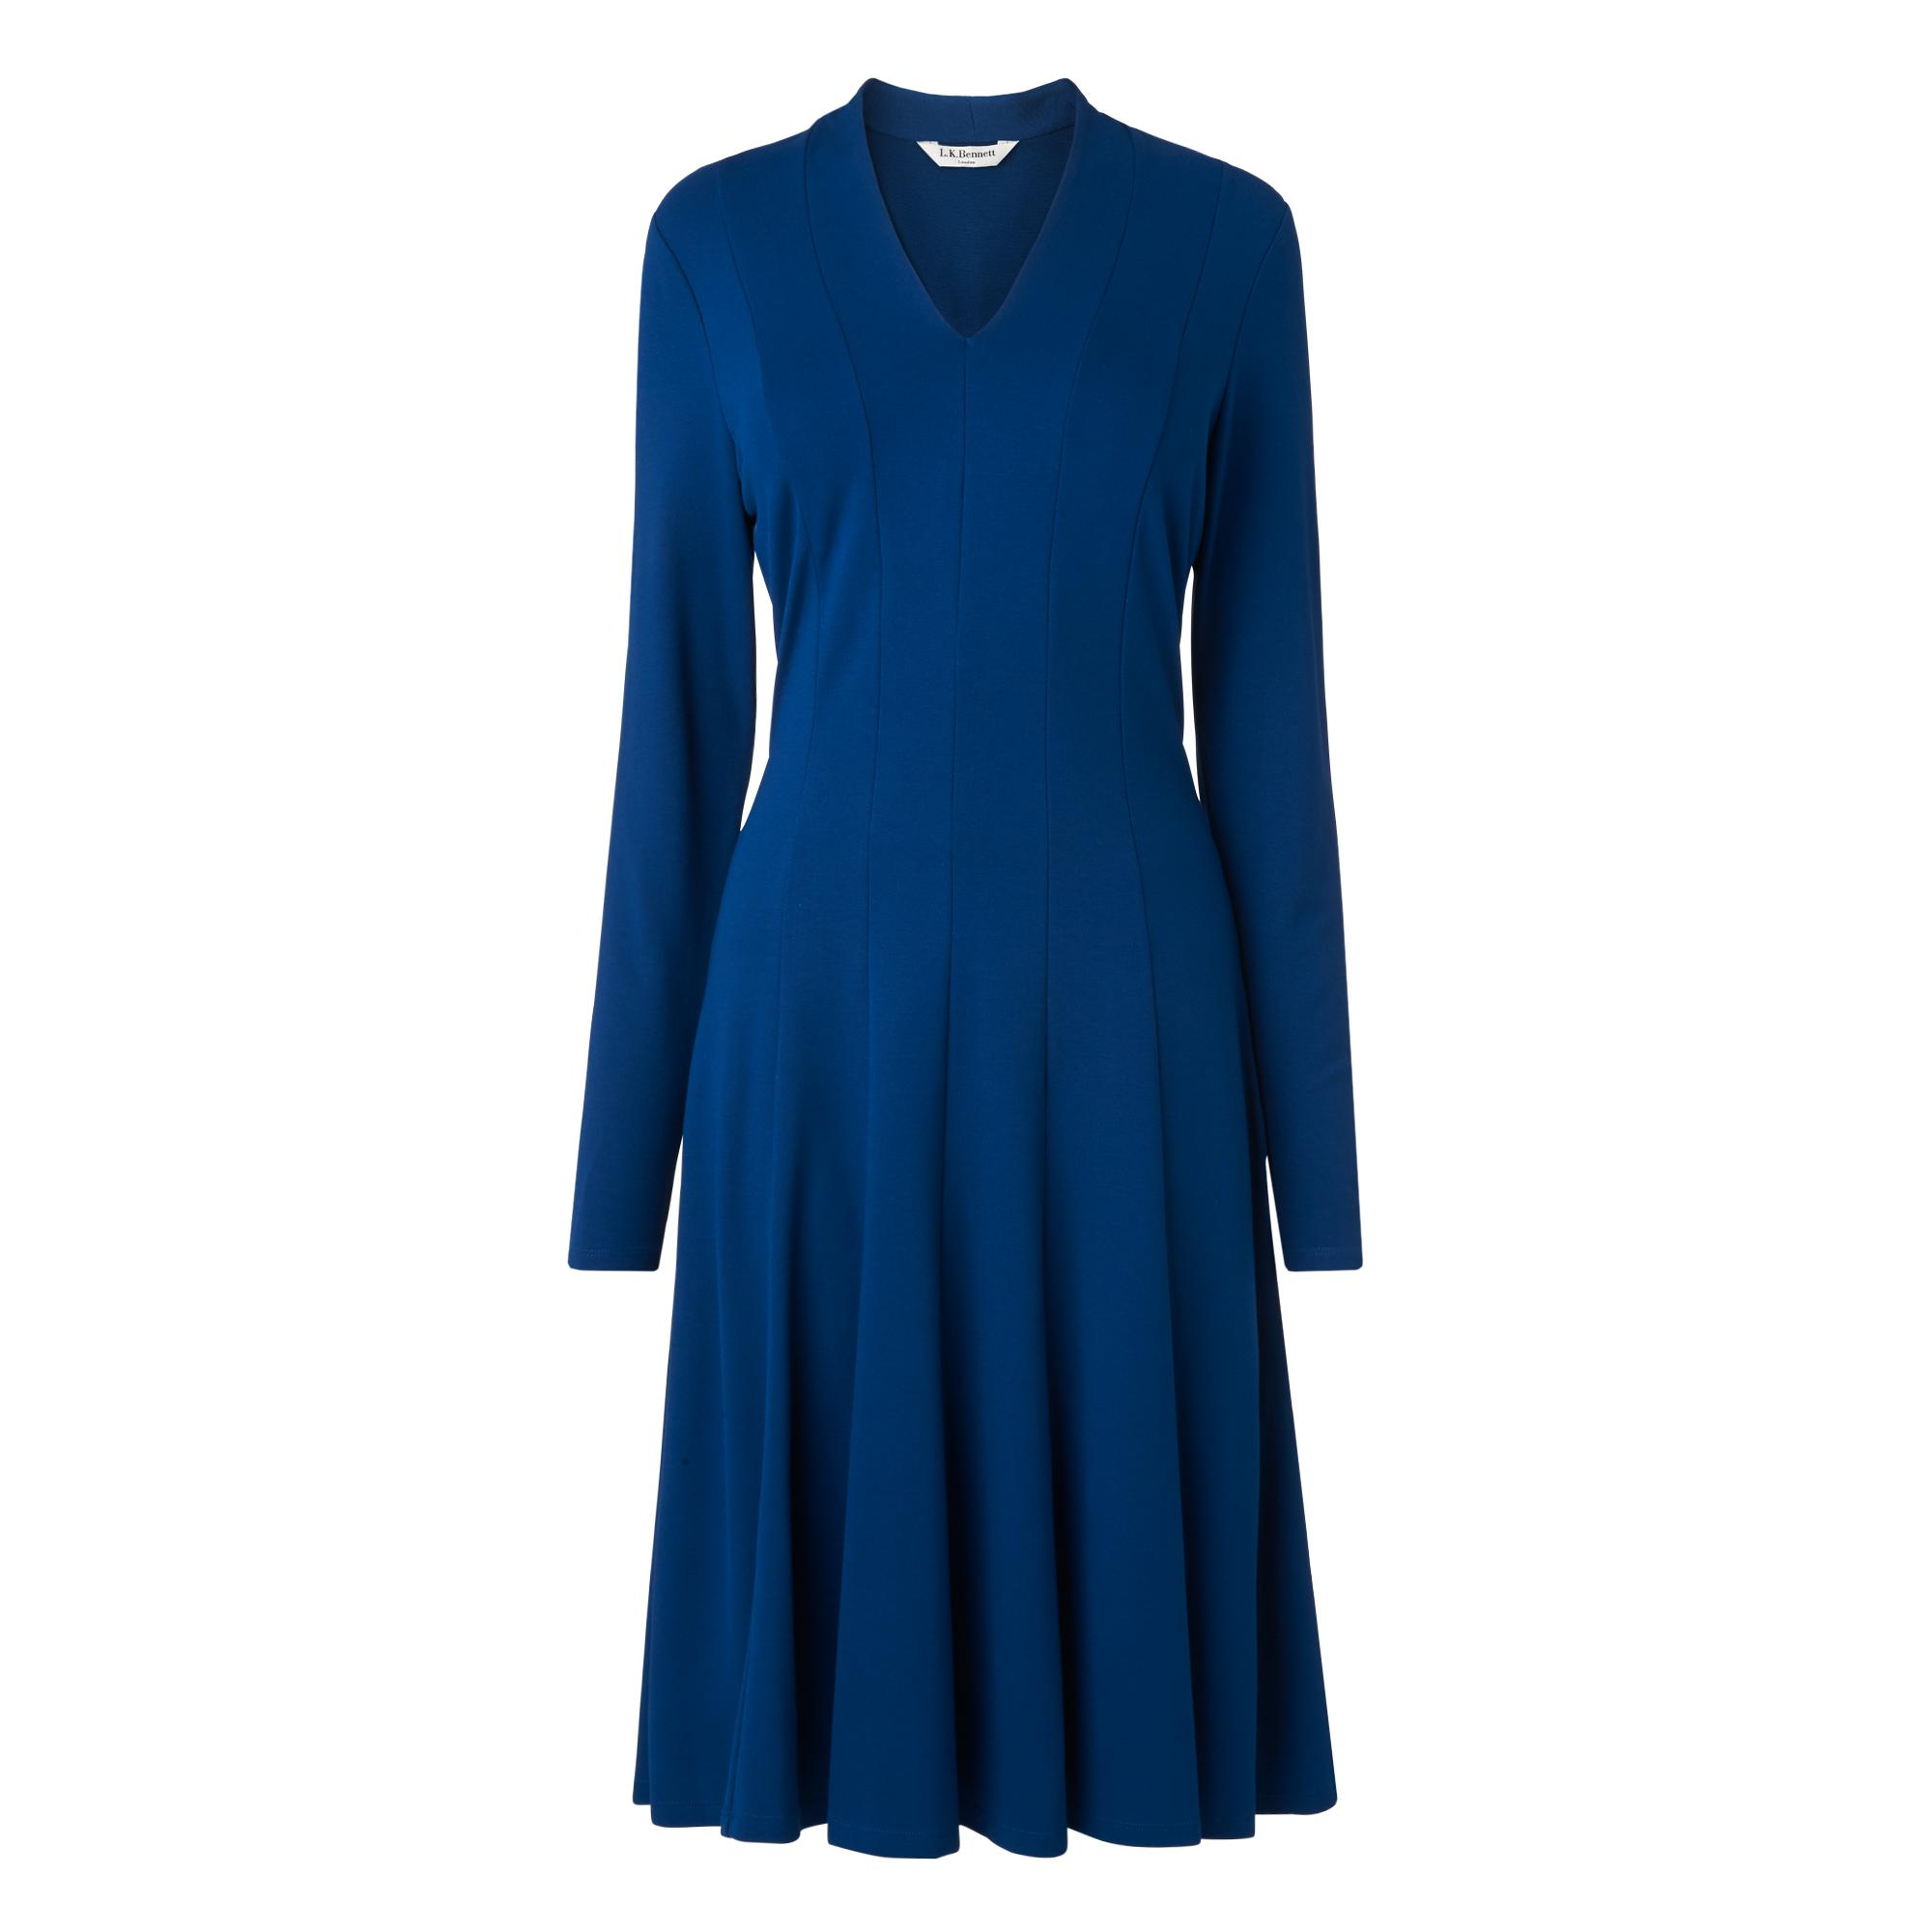 Aviana Blue Dress